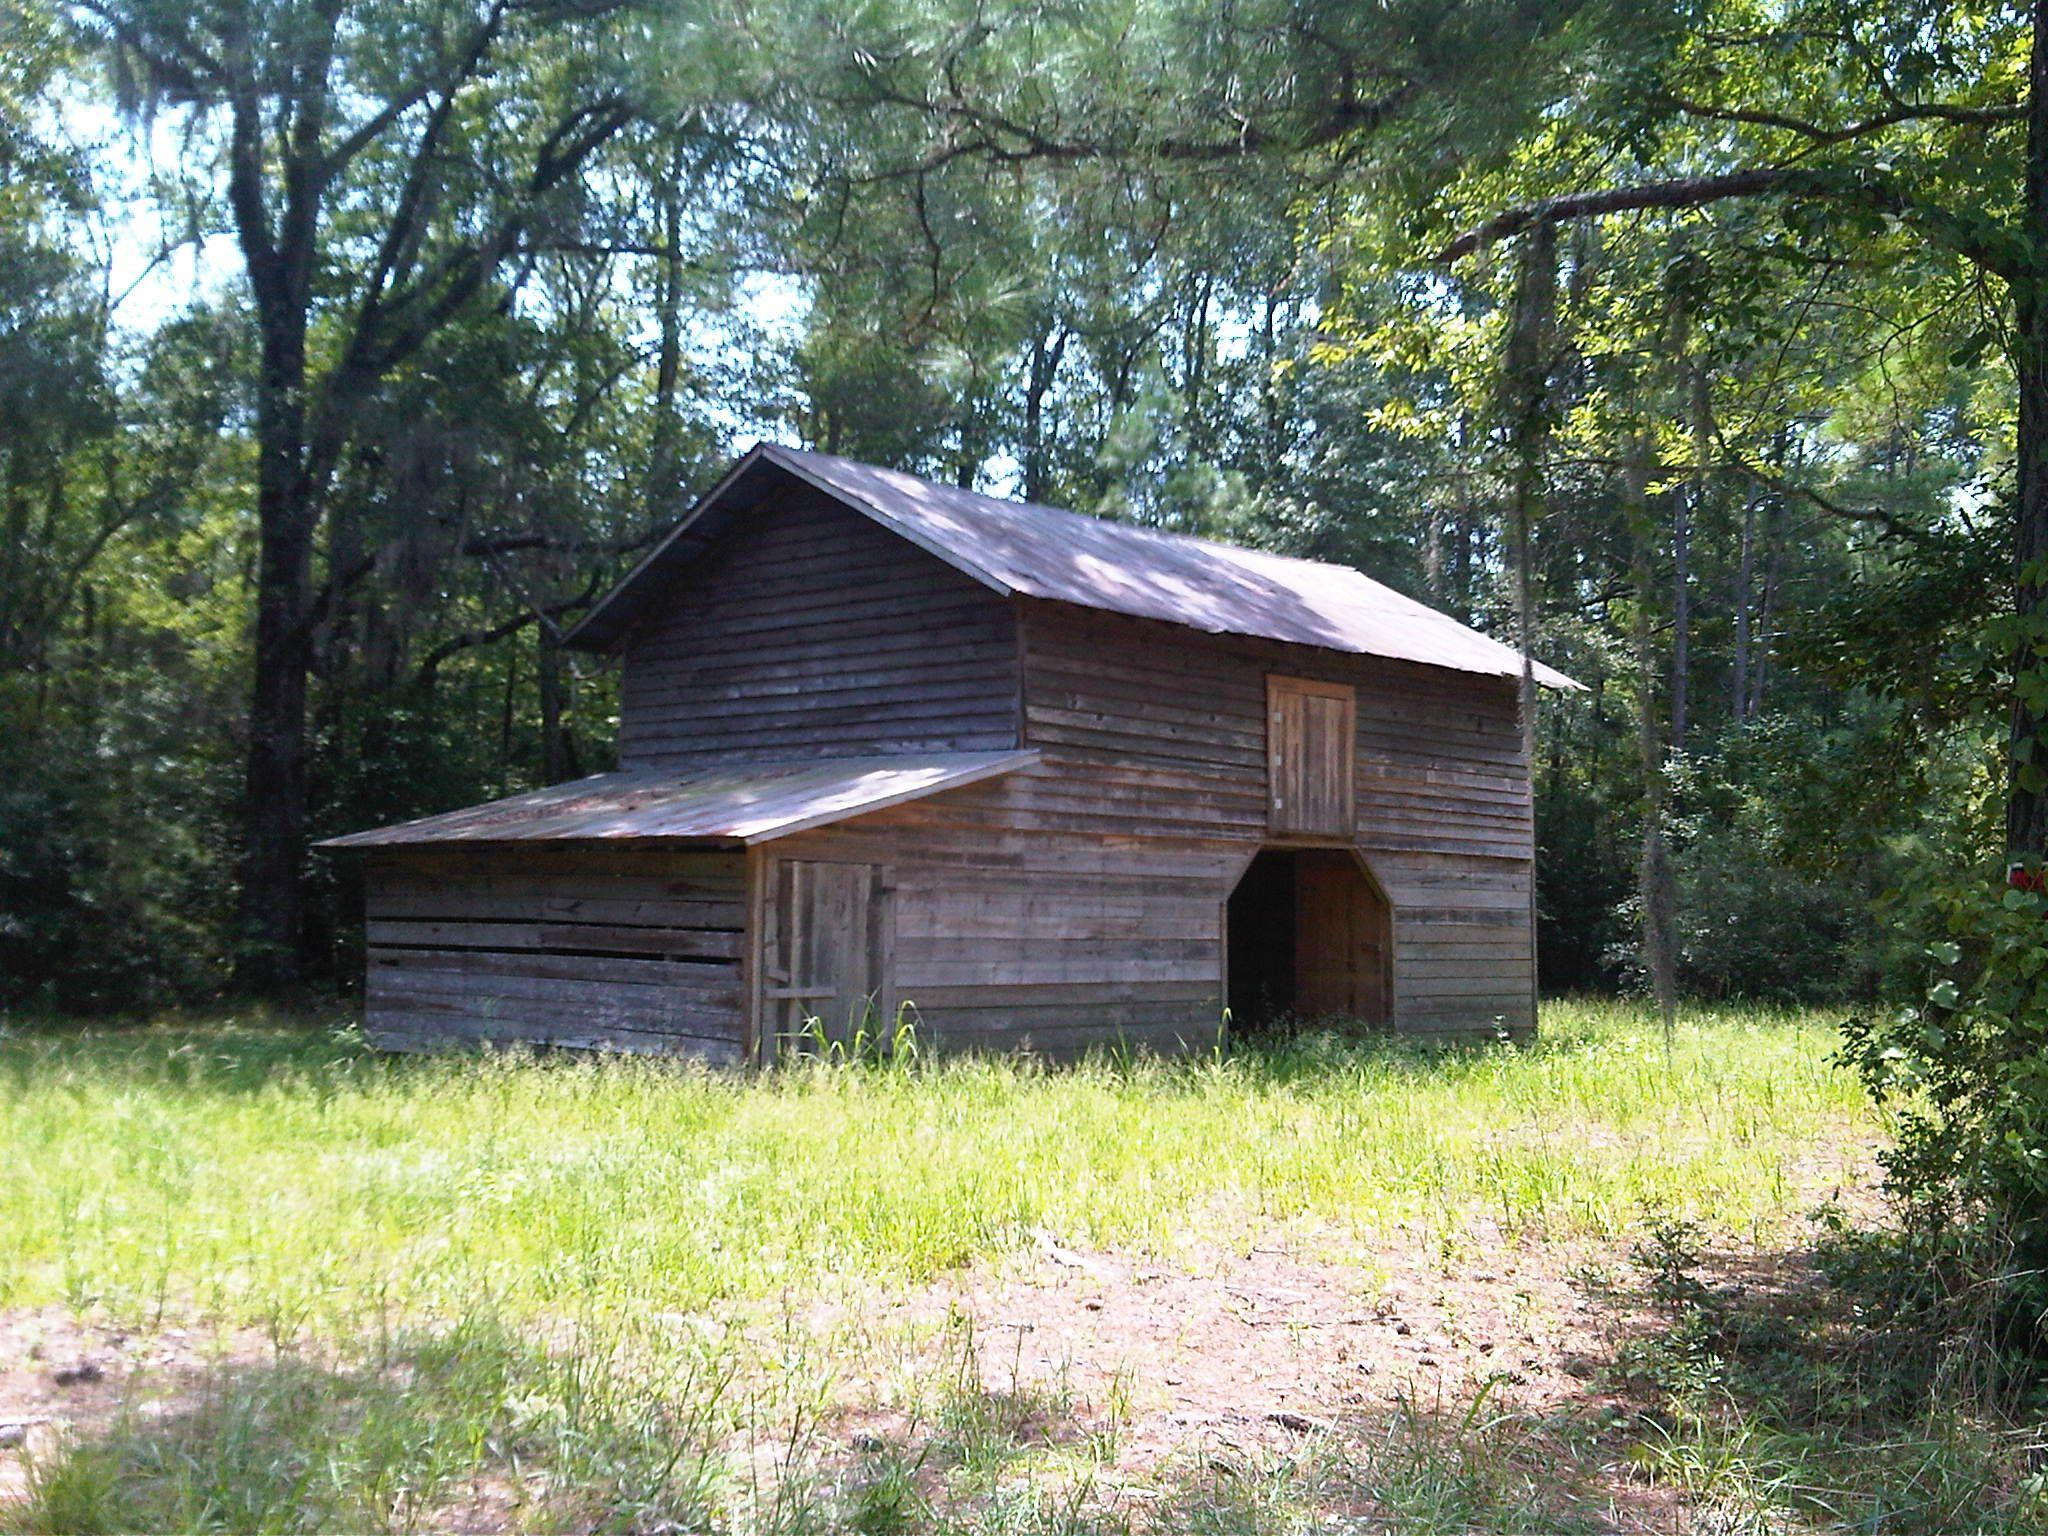 41 acres Conway SC - Property - LandAndFarm com - Land for